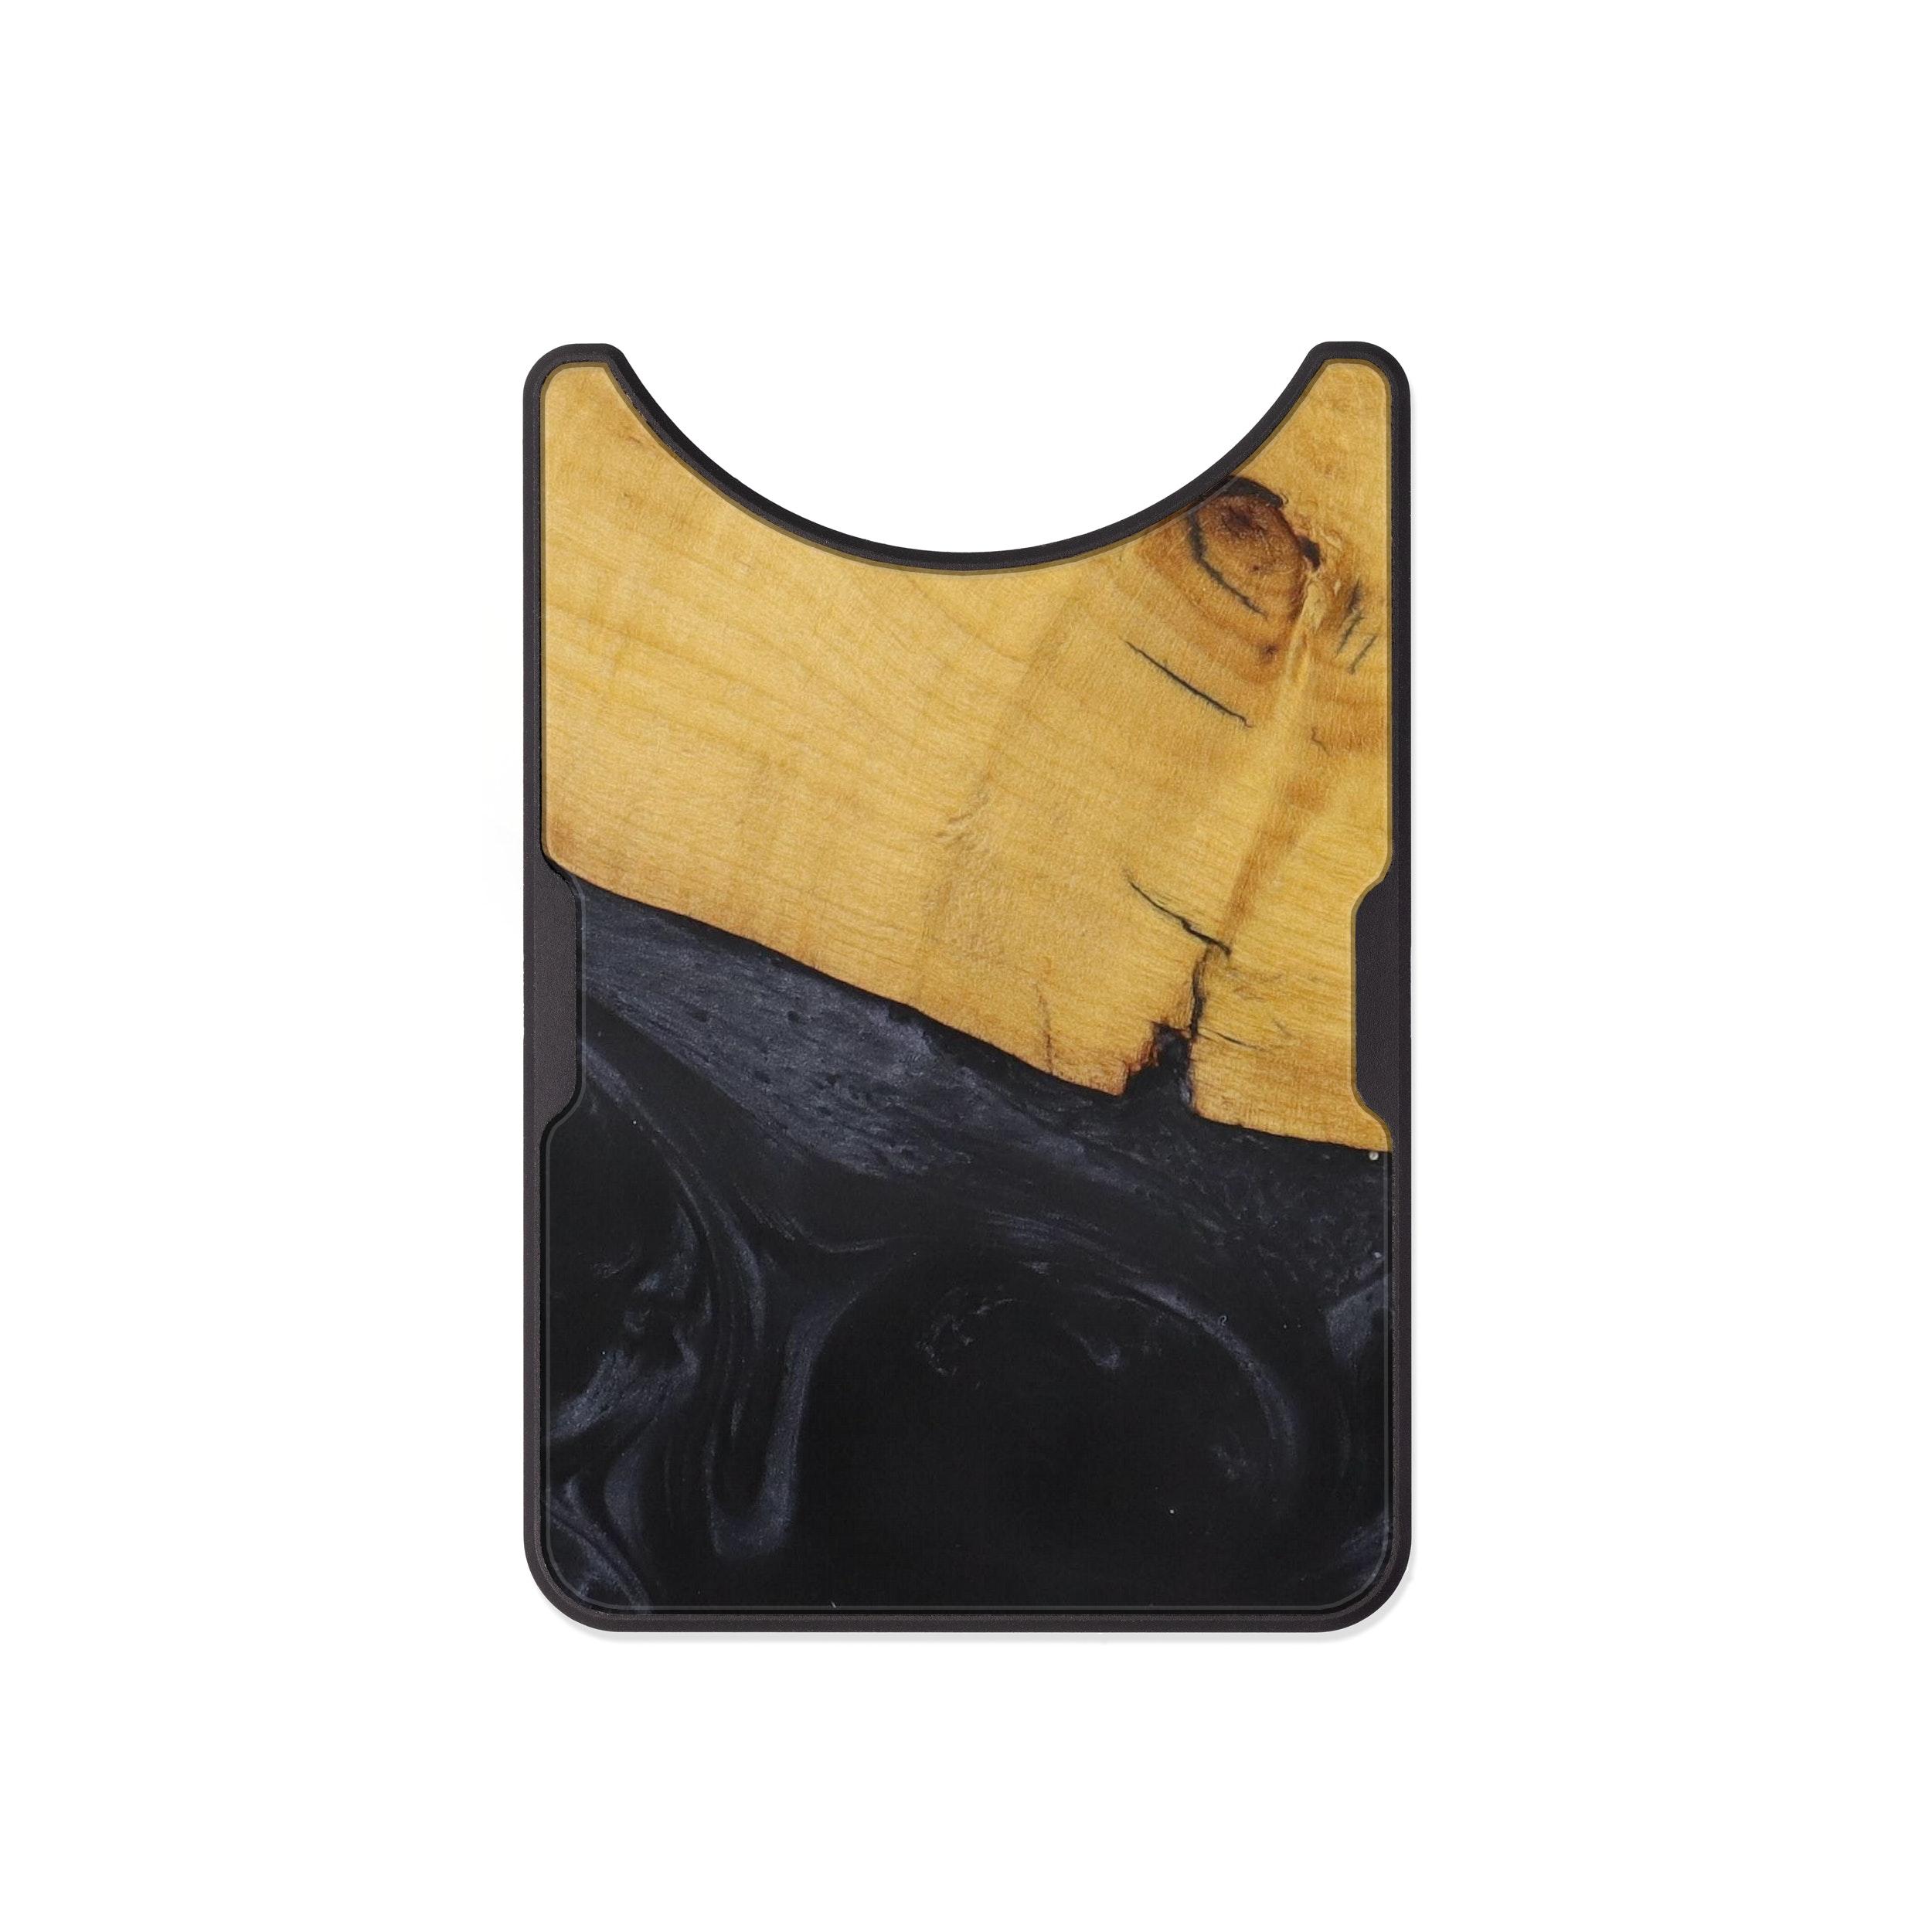 Alloy Wood+Resin Wallet - Kenyon (Pure Black, 472596)